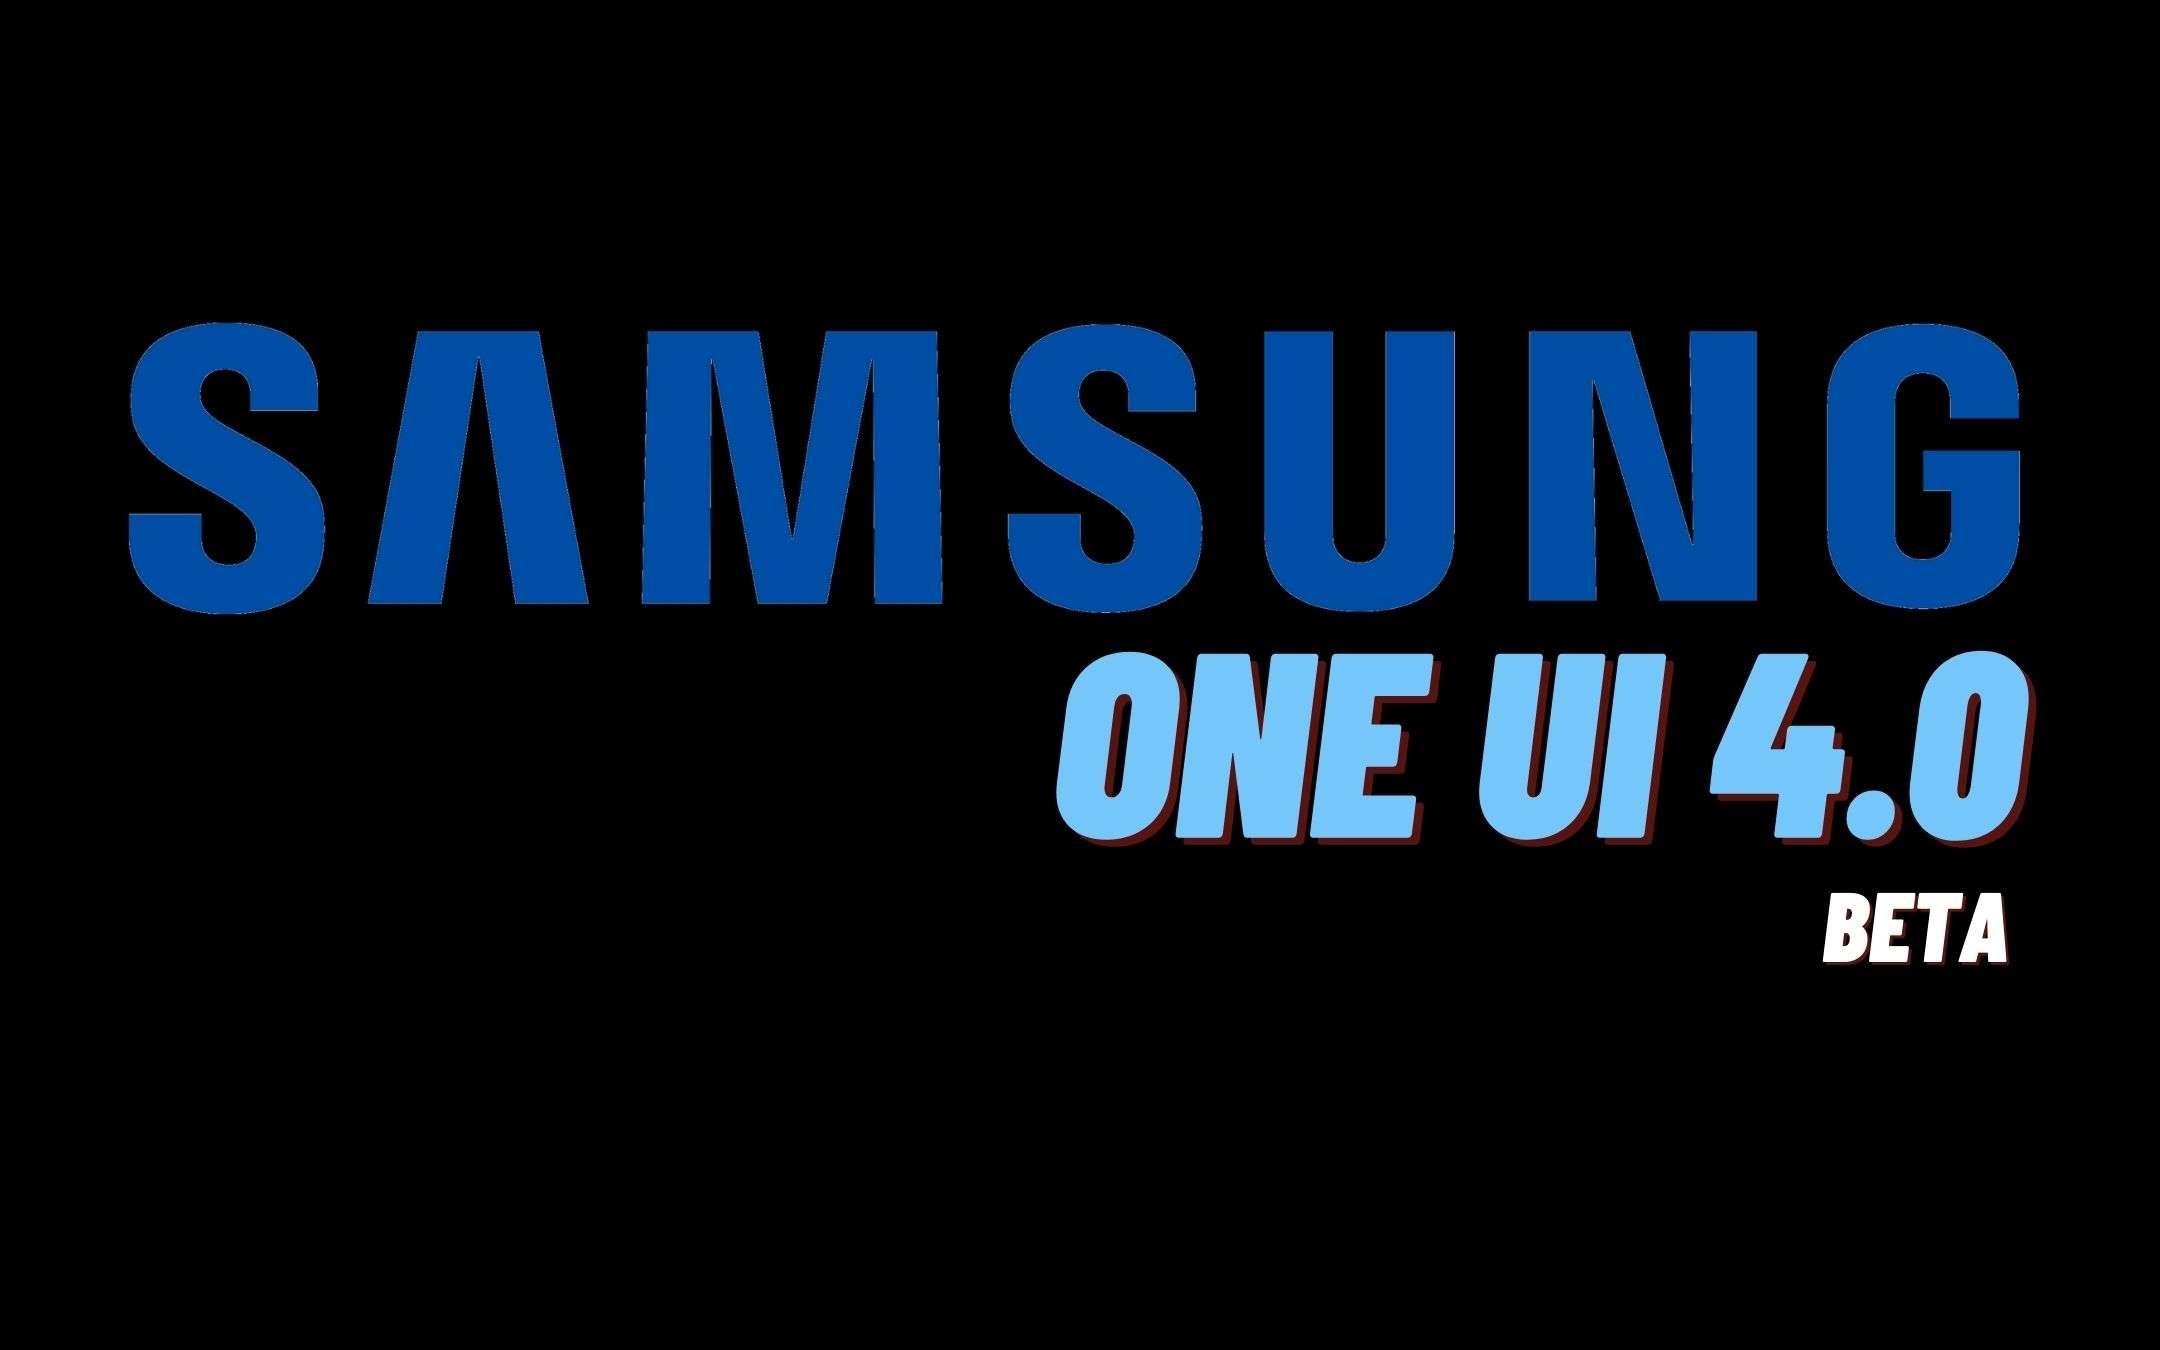 Samsung One UI 4.0 Beta